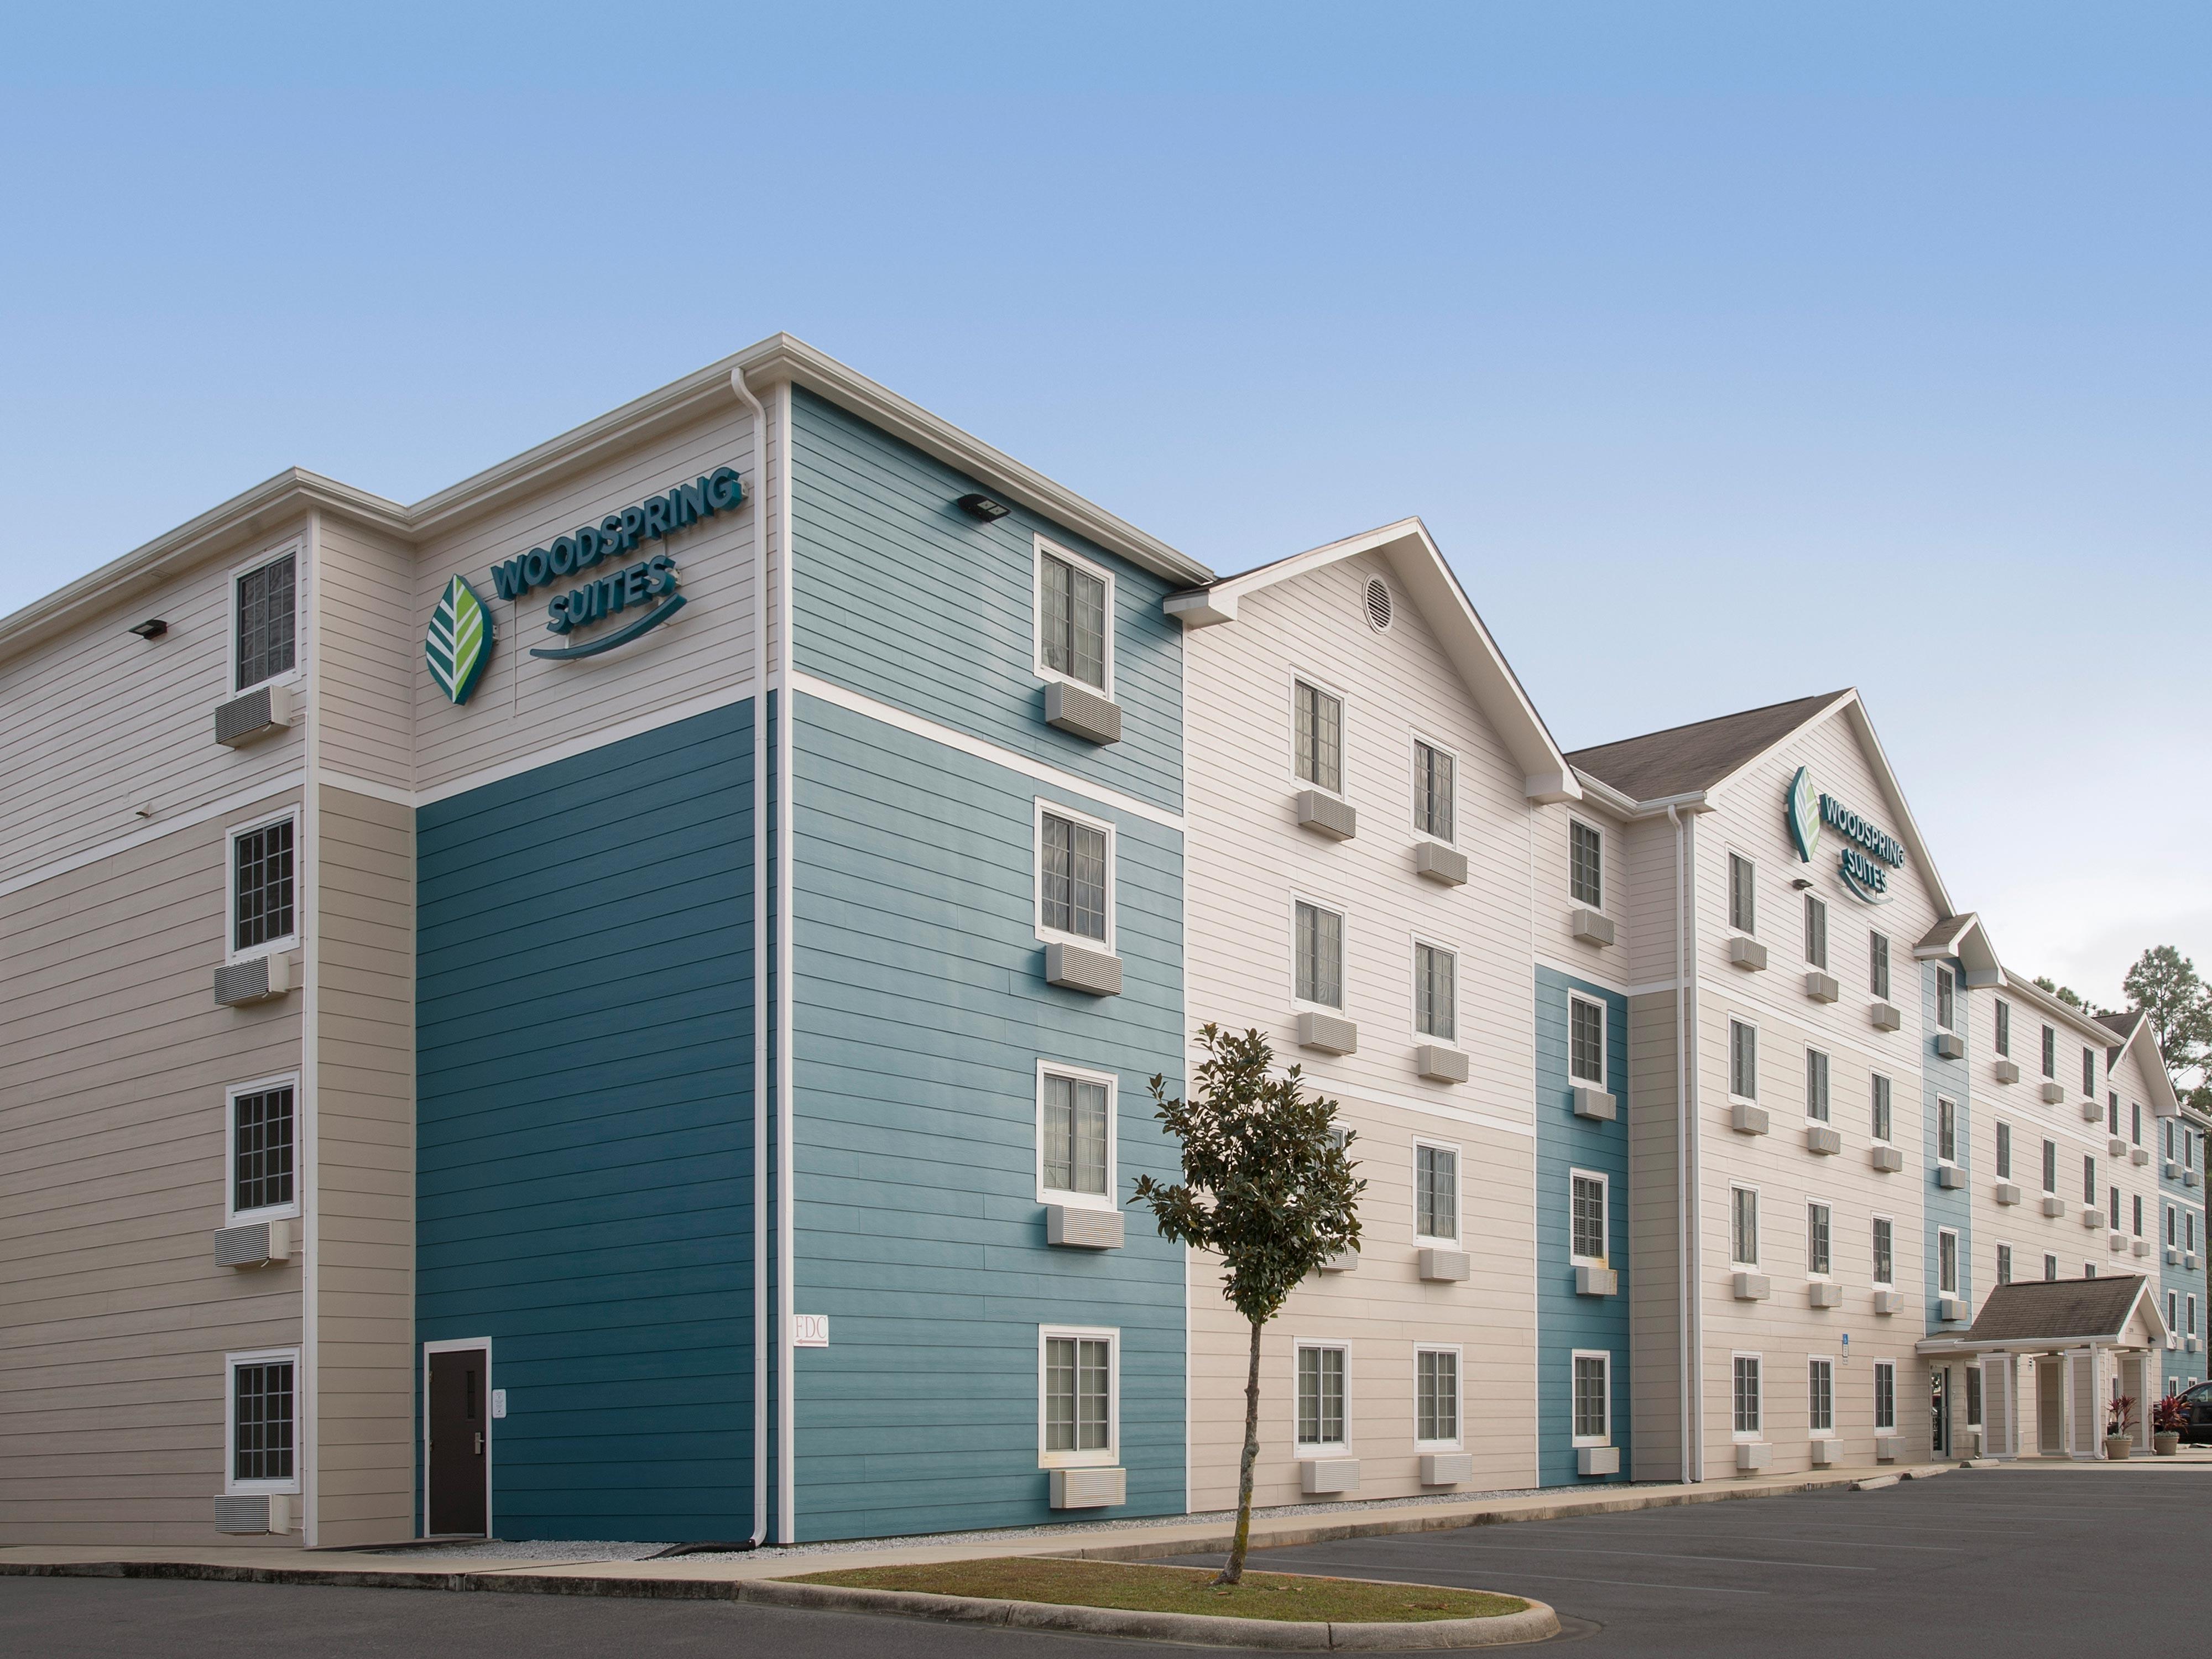 WoodSpring Suites Pensacola Northeast image 10